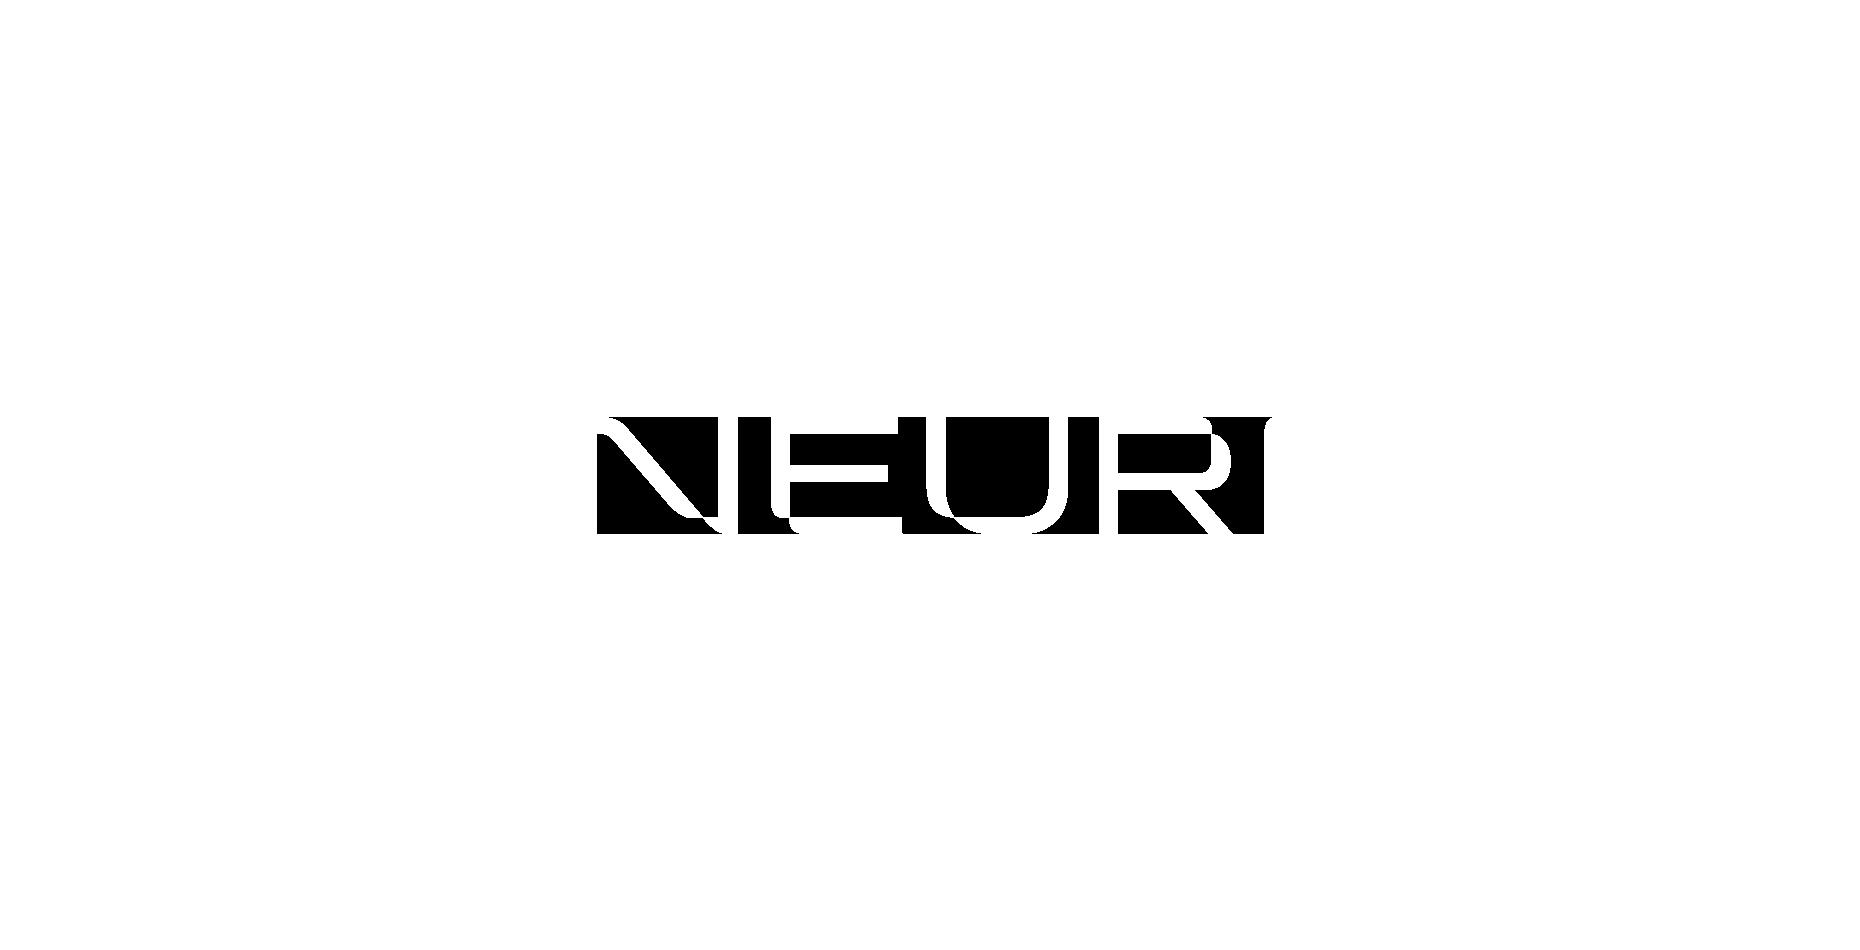 logo-design-4 2